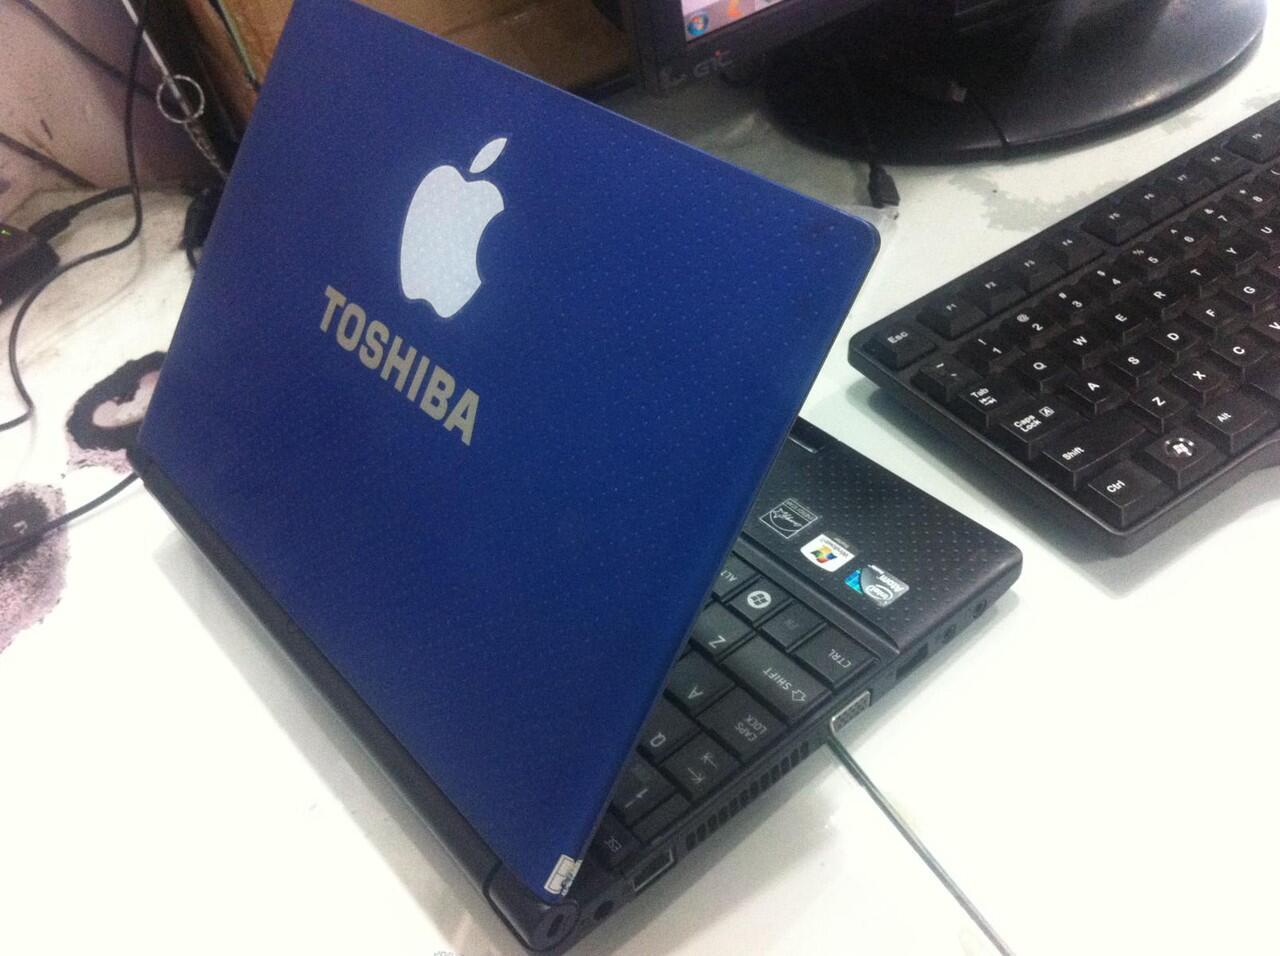 jual toshiba mini notebook nb505-n500bl murah saja gan monggo yg minat